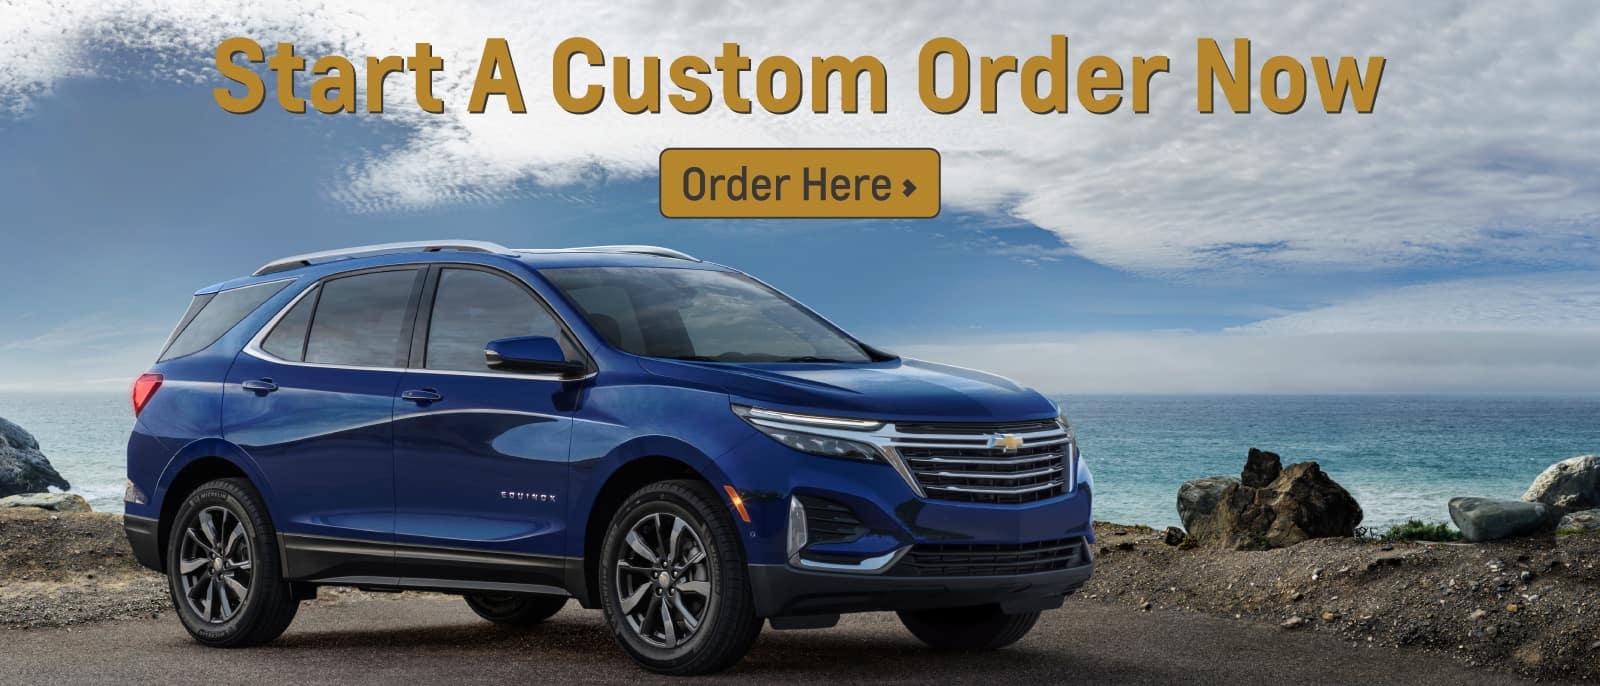 Start a Hyundai Custom Order